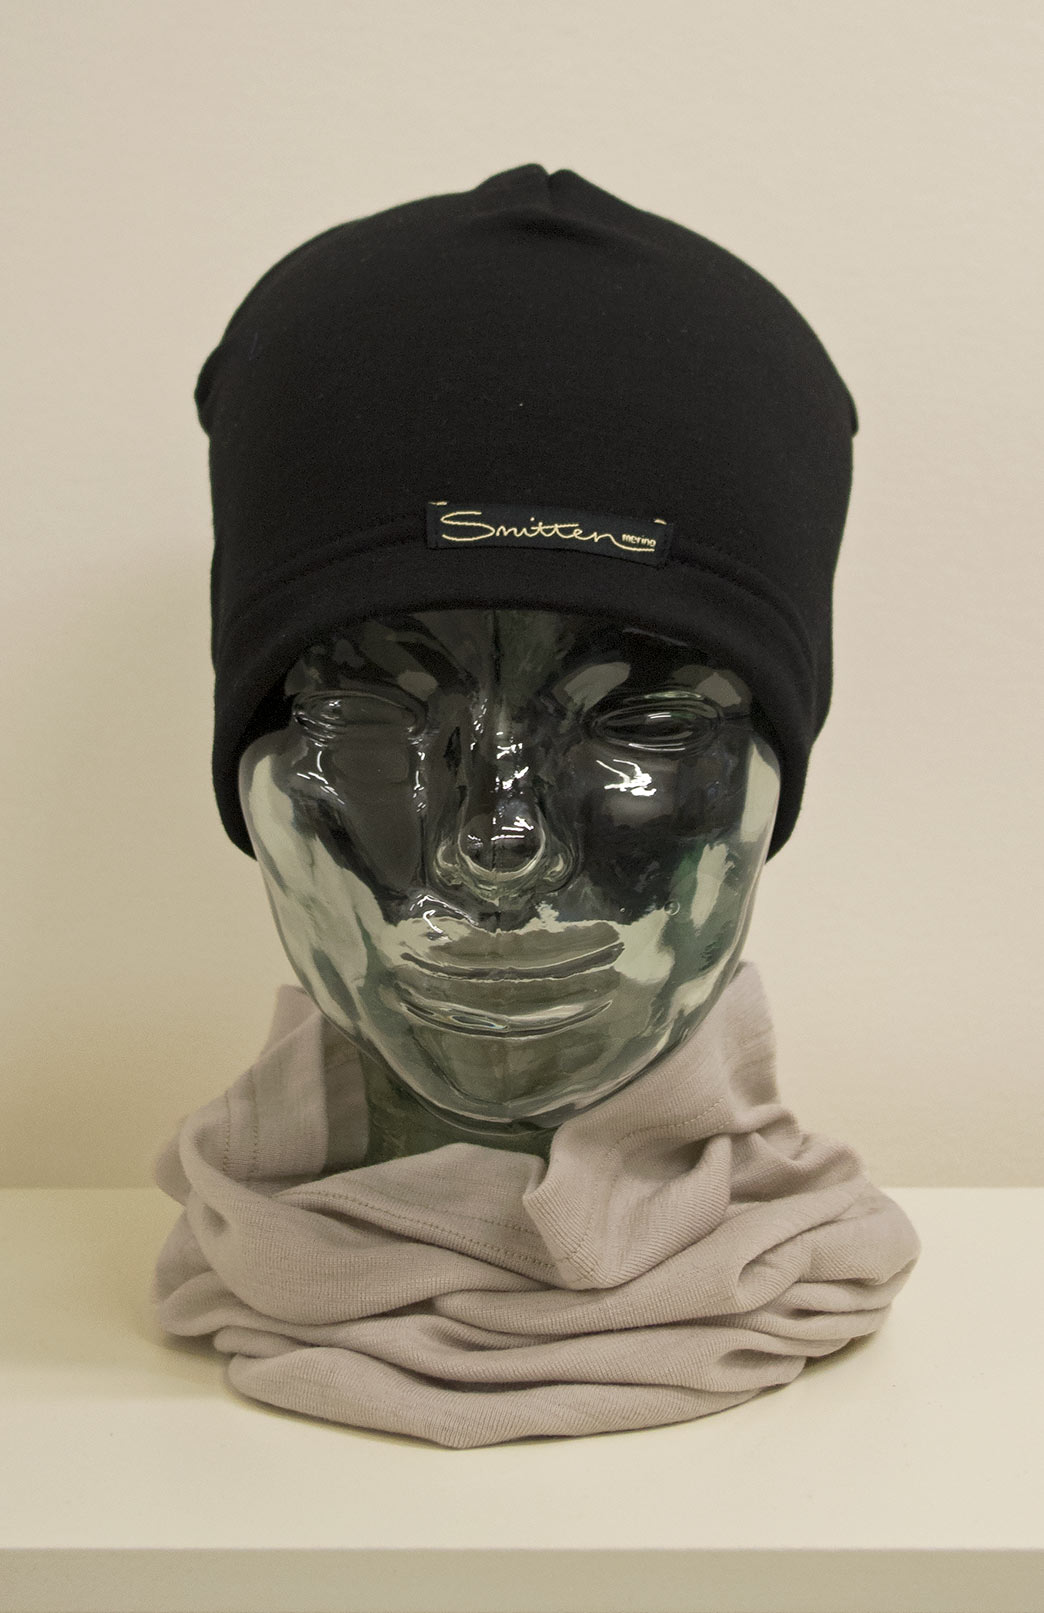 Beanie - Fleece - Unisex Black Merino Wool Fleece Beanie - Smitten Merino Tasmania Australia